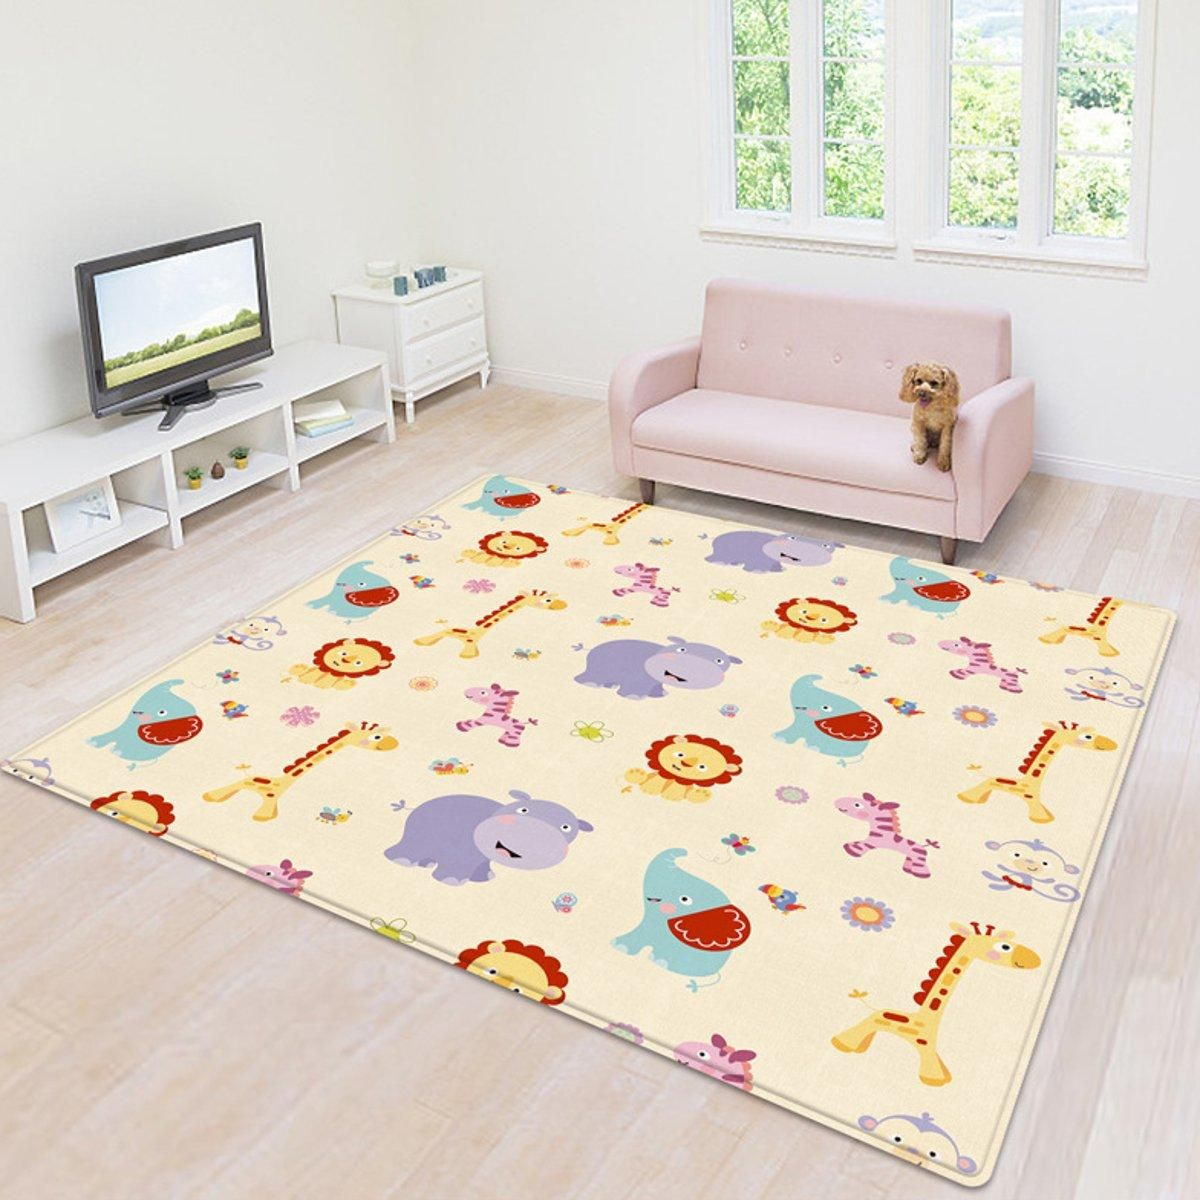 Non slip Baby Floor Play Mat Foam Floor Child Activity Soft Gym Crawl Creeping Blanket